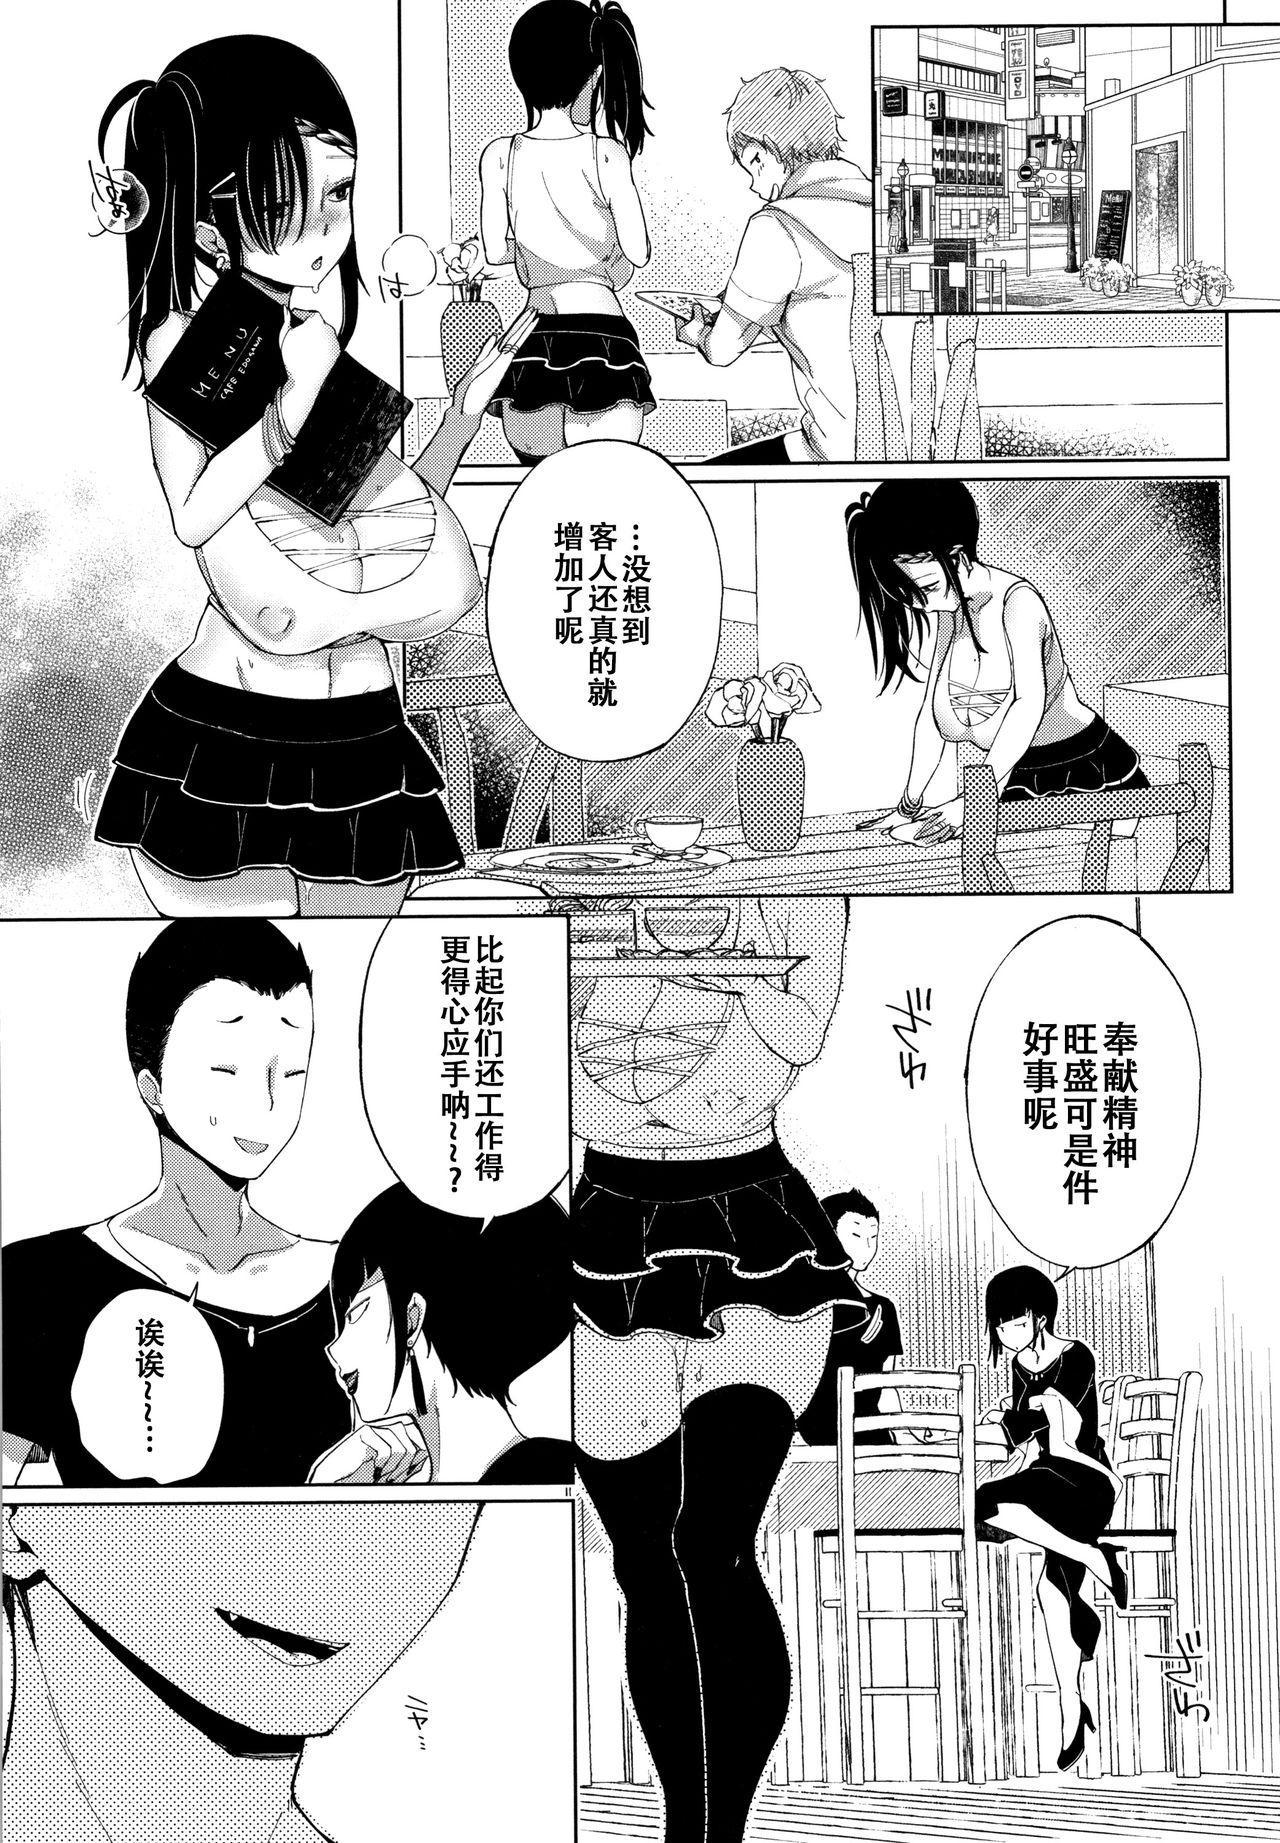 [Achumuchi] Saijaku Gal wa Ikizurai! - The weakest pussy is hard to go.ch.1-3 [Chinese] [战栗的玻璃棒汉化] [Ongoing] 40